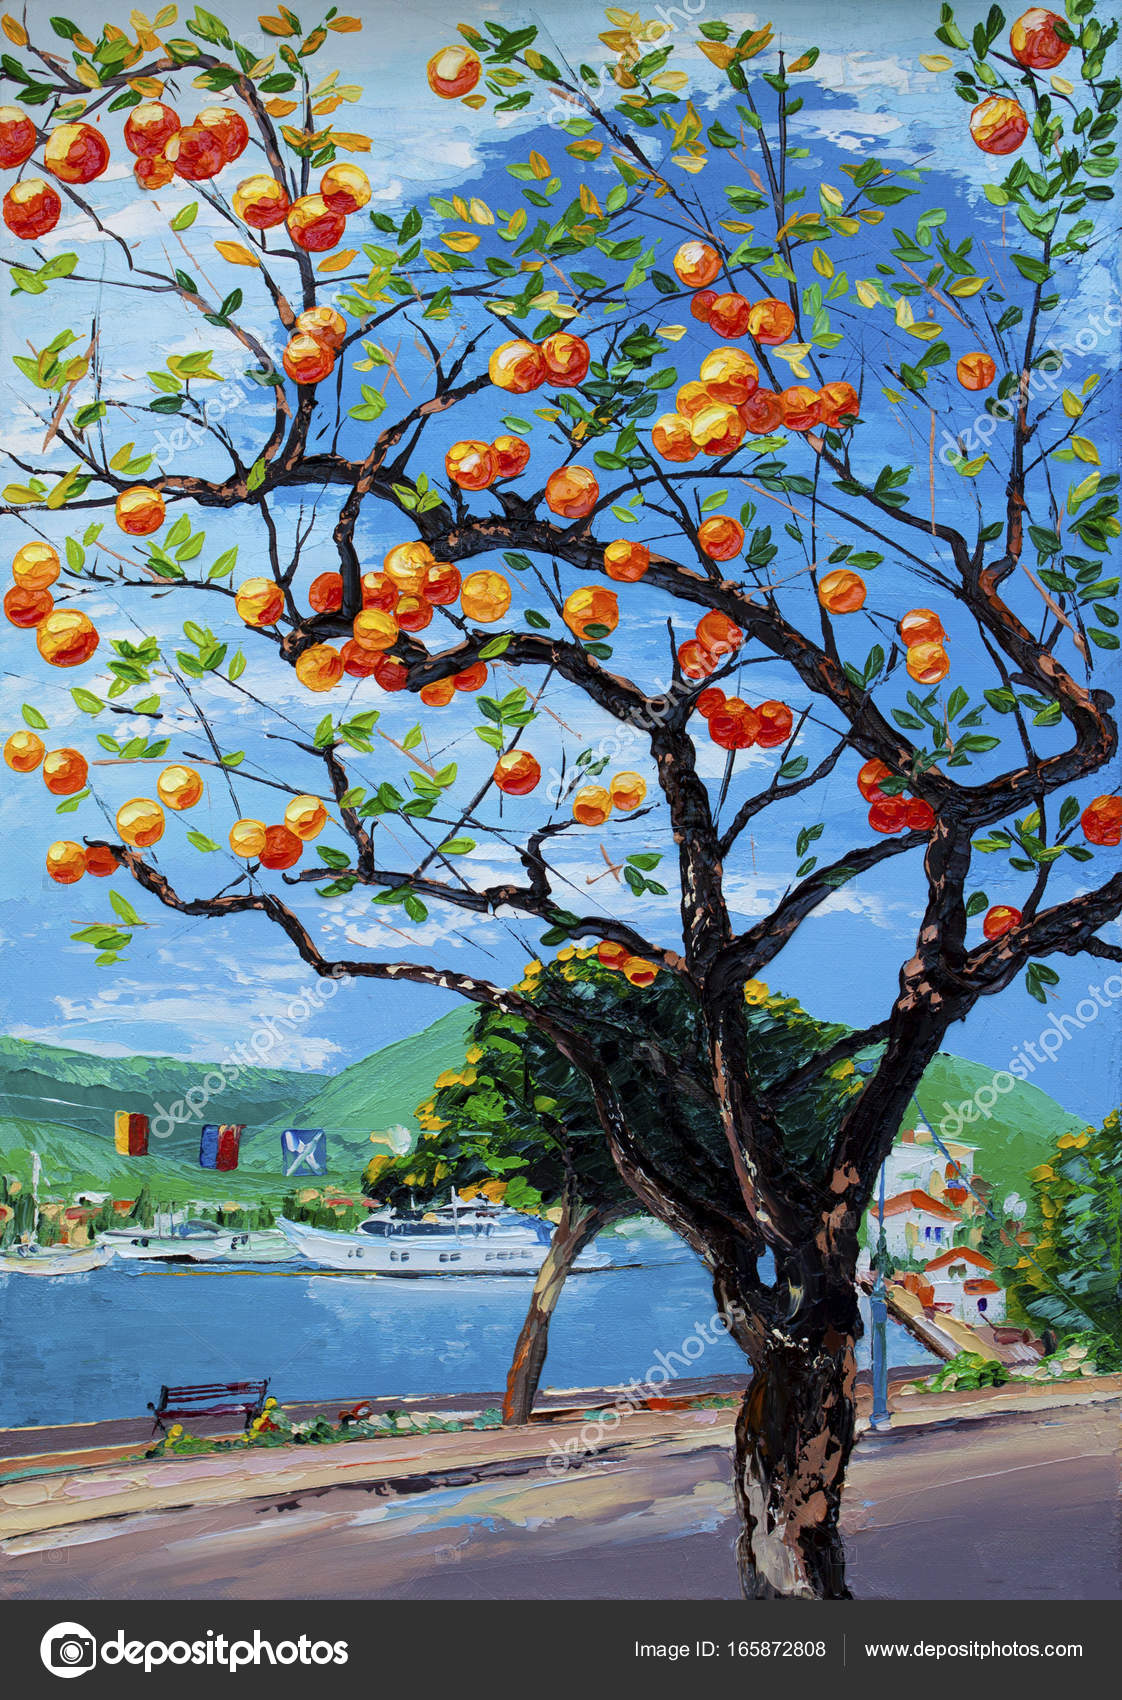 Orange Tree Oil Painting In Greece Stock Photo C Viarti23 165872808